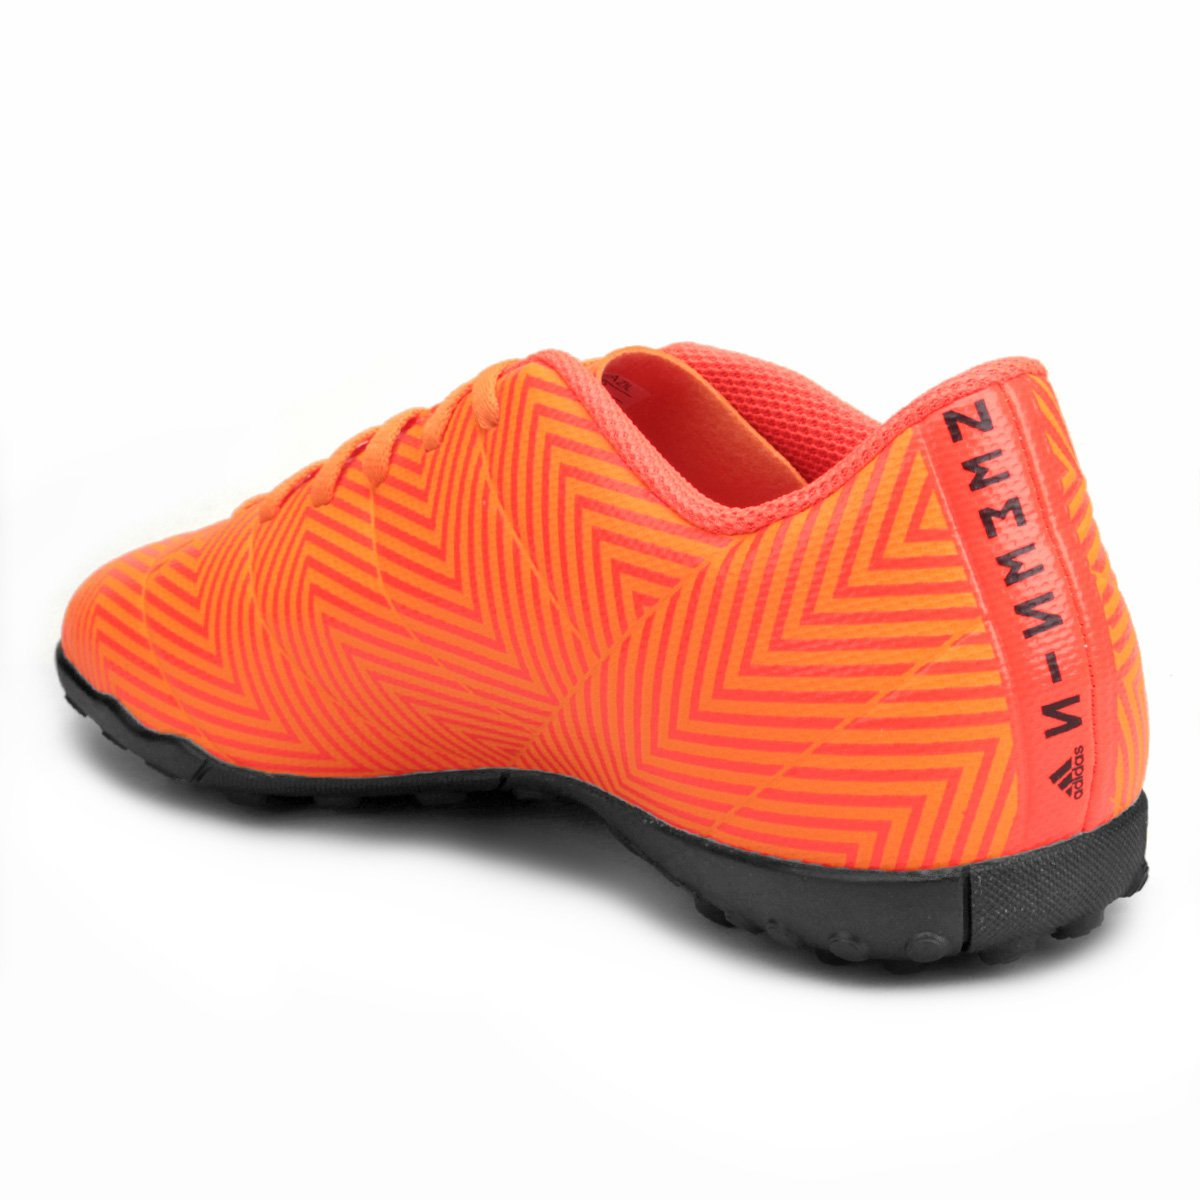 625734b018 Chuteira Society Adidas Nemeziz Tango 18 4 TF - Laranja e Preto ...